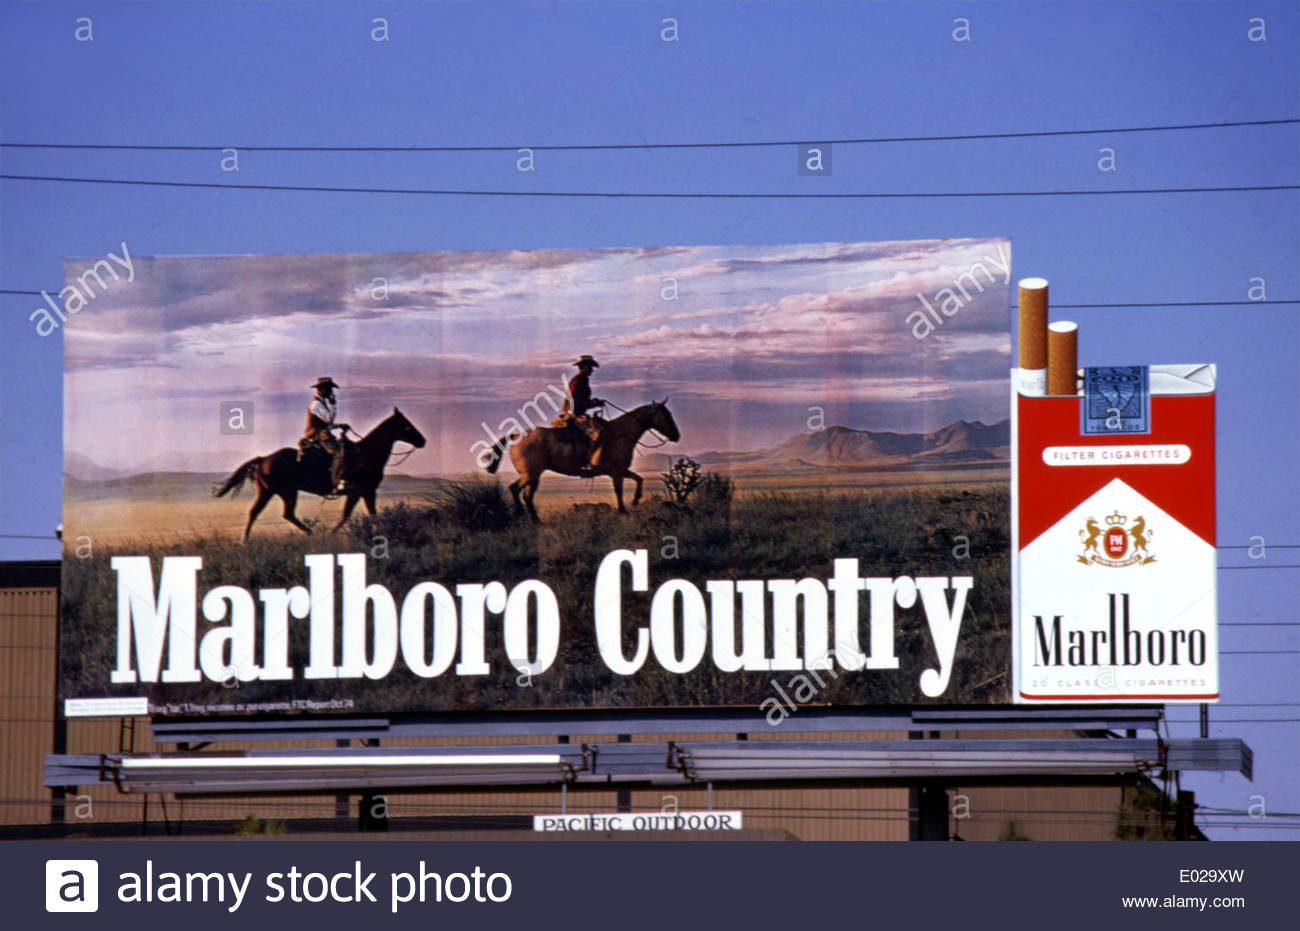 Marlboro cigarettes most popular